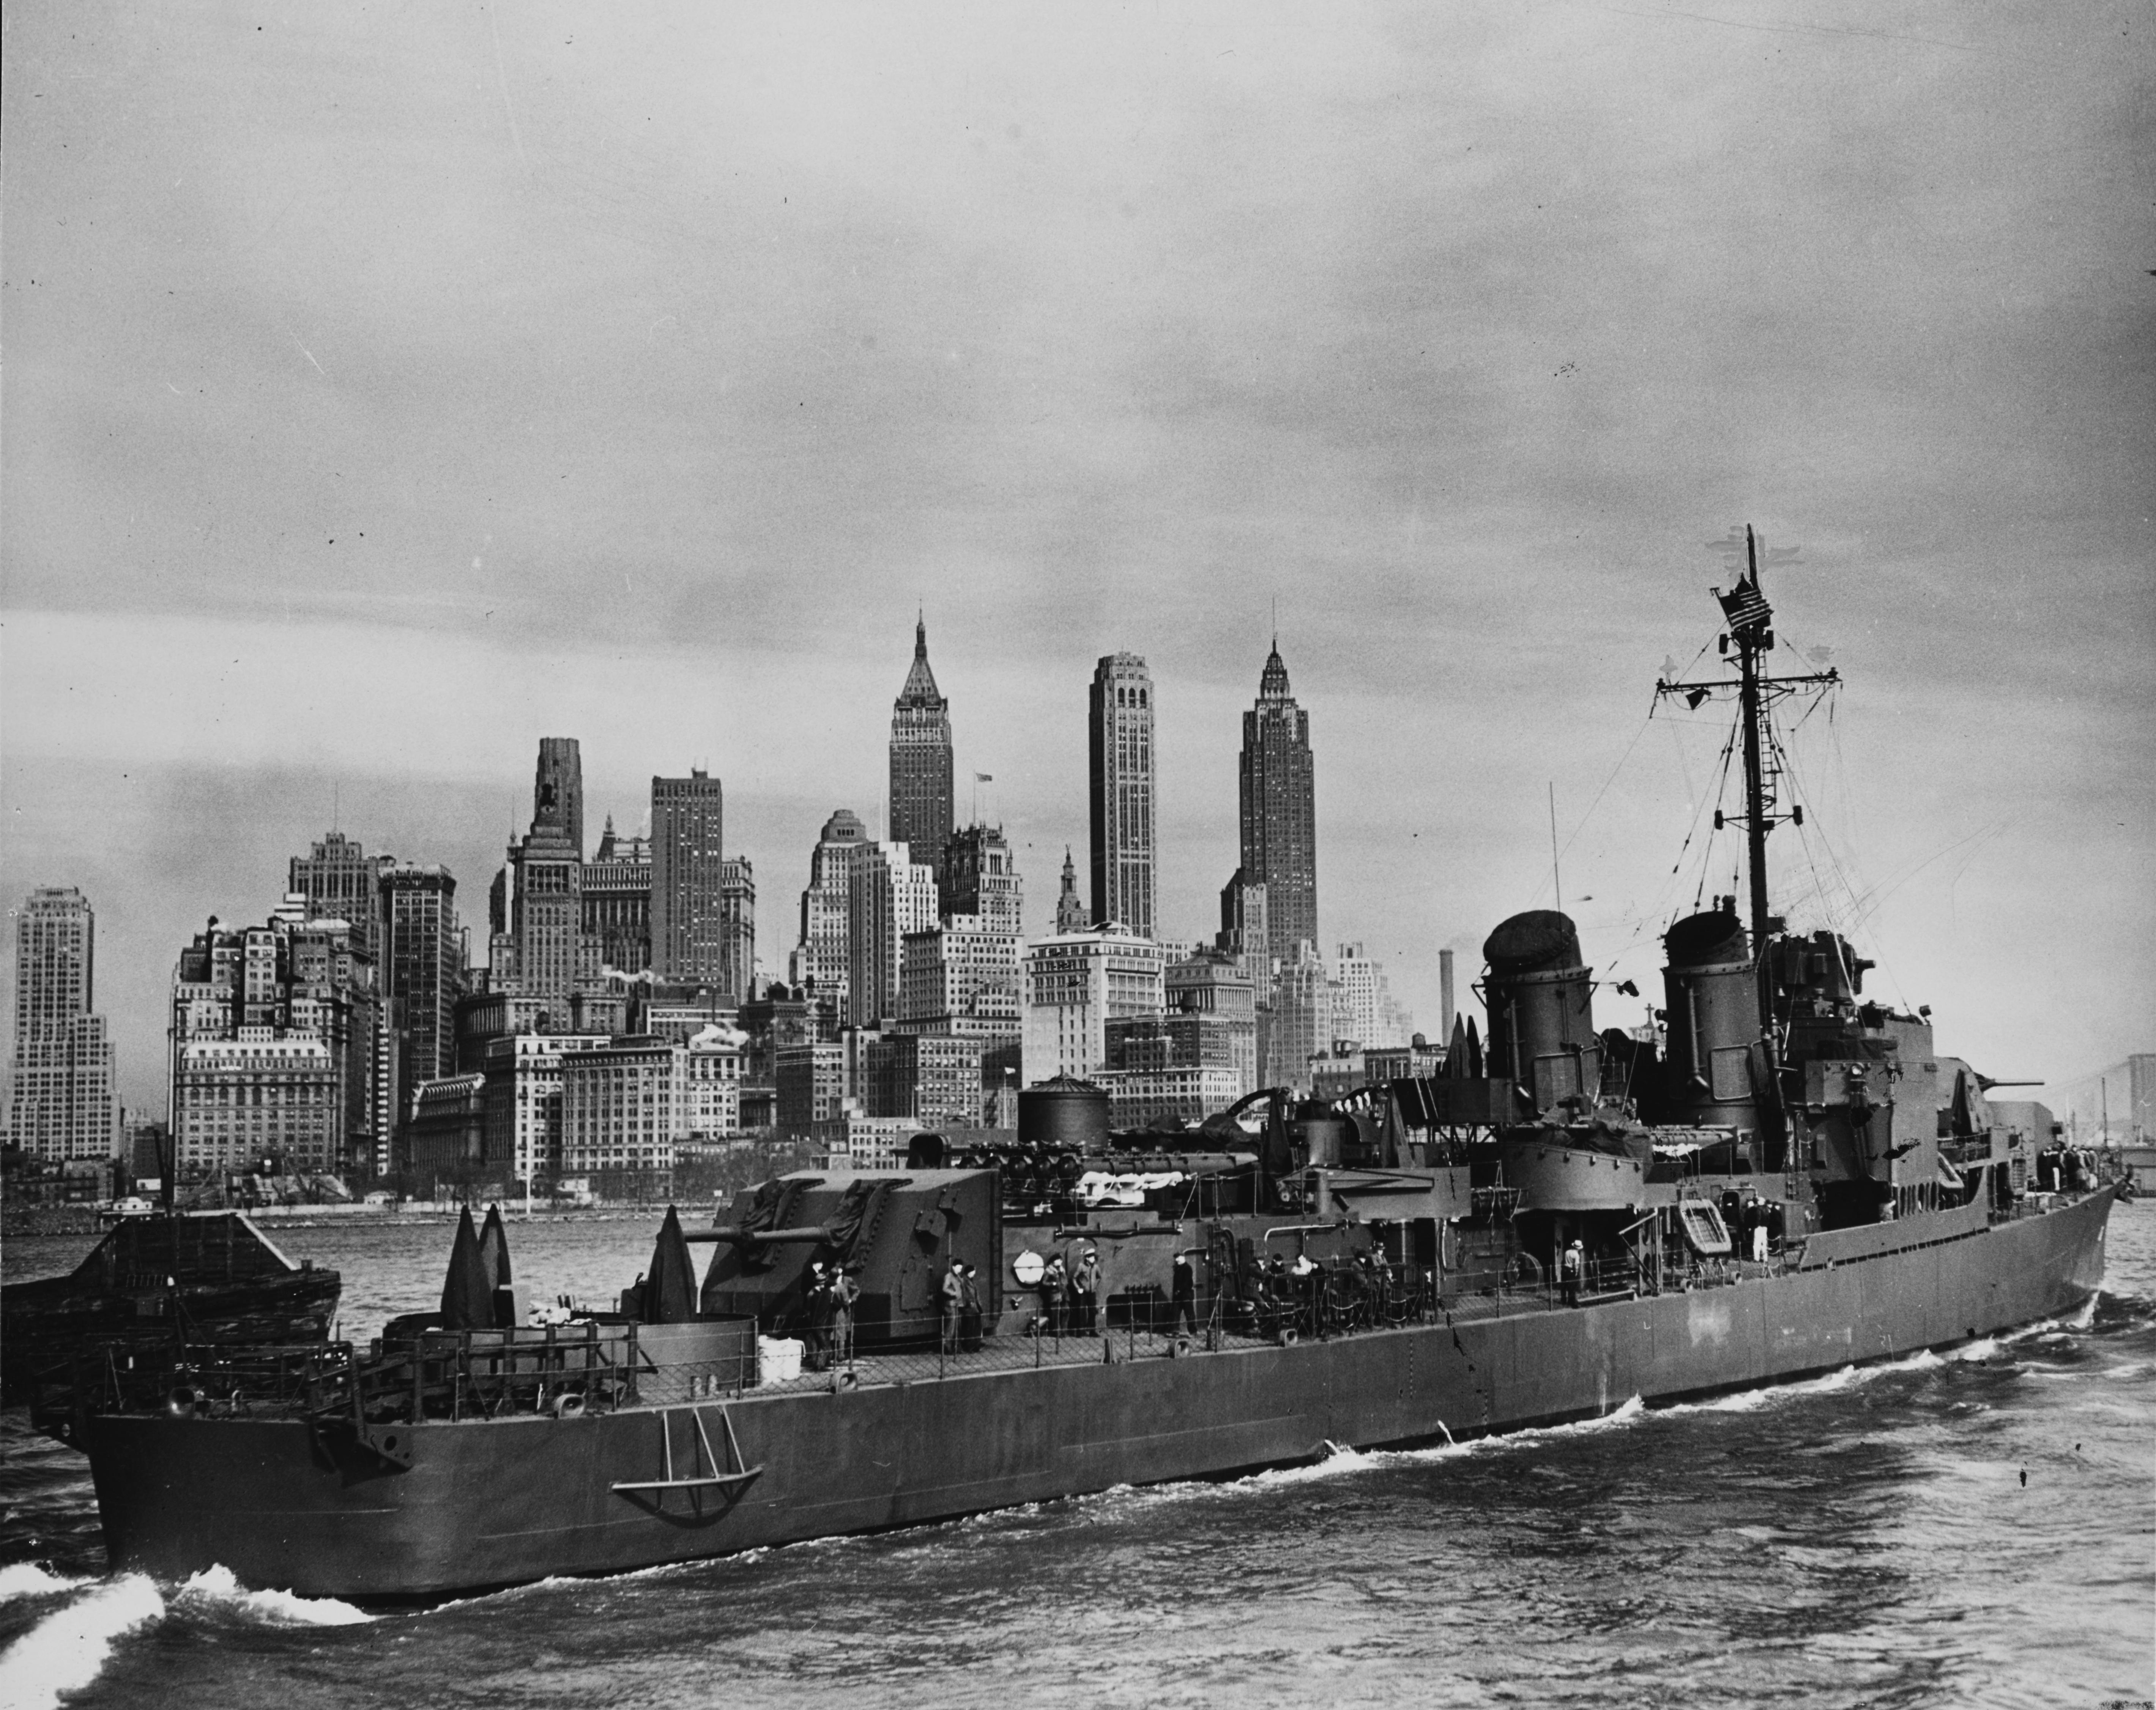 http://upload.wikimedia.org/wikipedia/commons/6/67/USS_Harlan_R._Dickson_%28DD-708%29.jpg